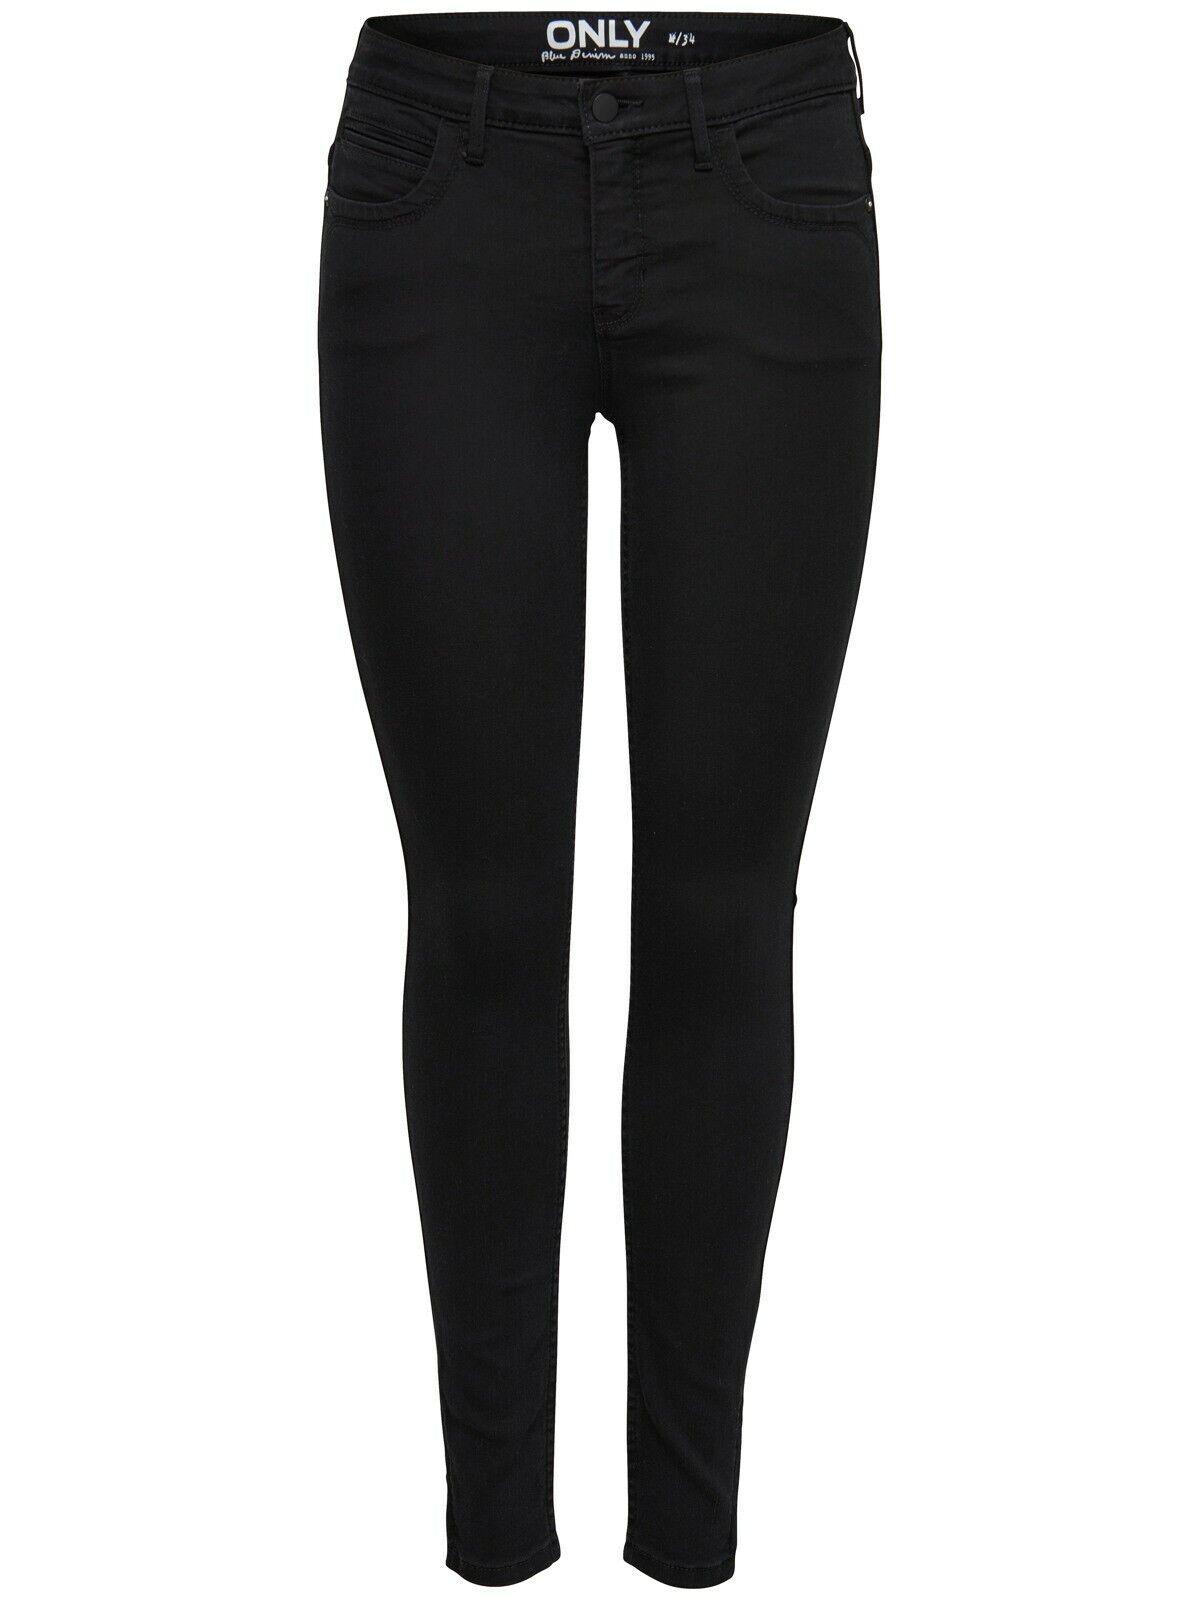 Only Damen Jeans Damenhose Kendell Knöchellang Reißverschluss Knöchel Slim-Fit